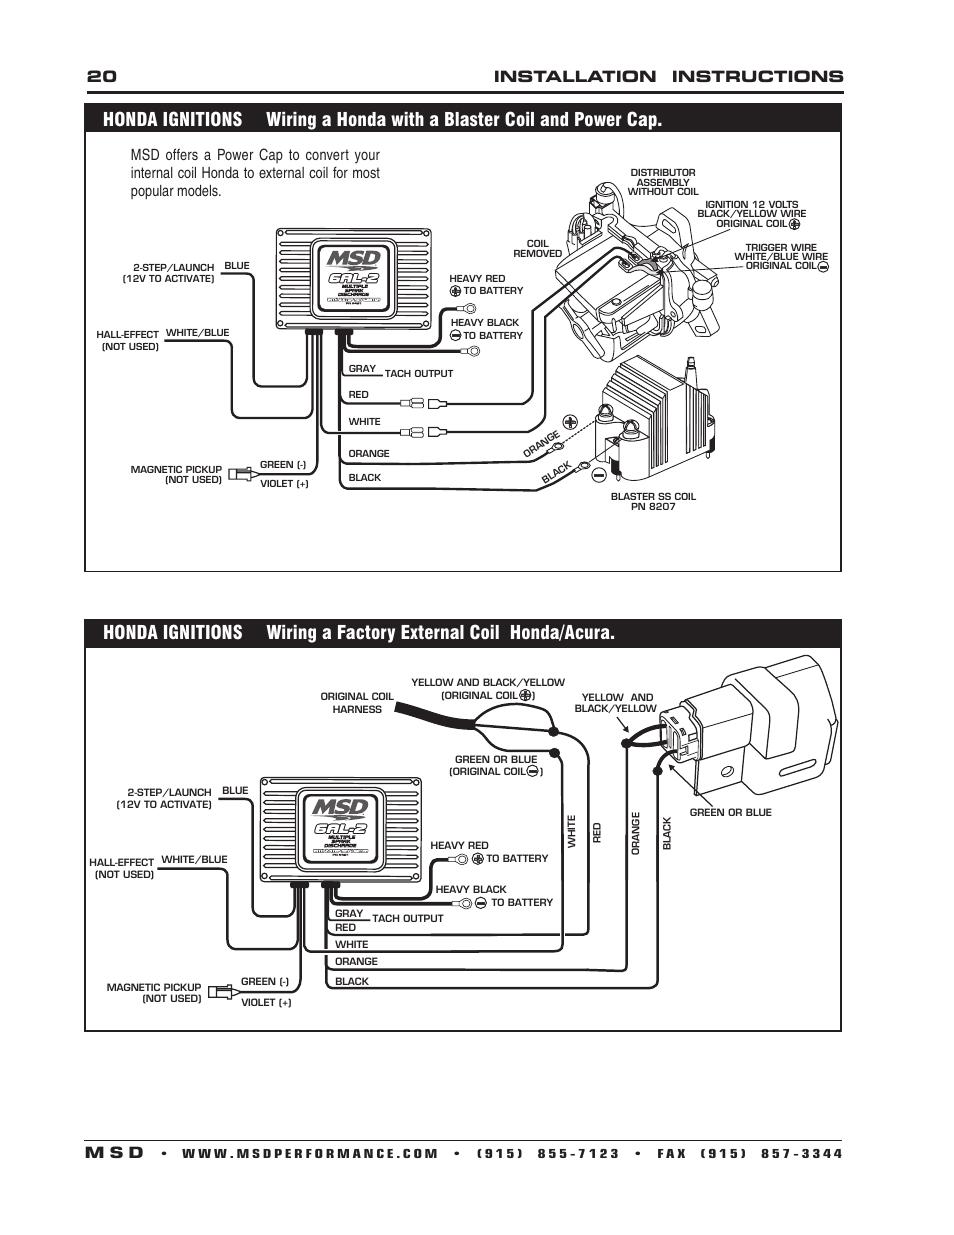 Msd 7al 3 Wiring Diagram Two Step - Wiring Diagram Post Msd Al Wiring Diagram on